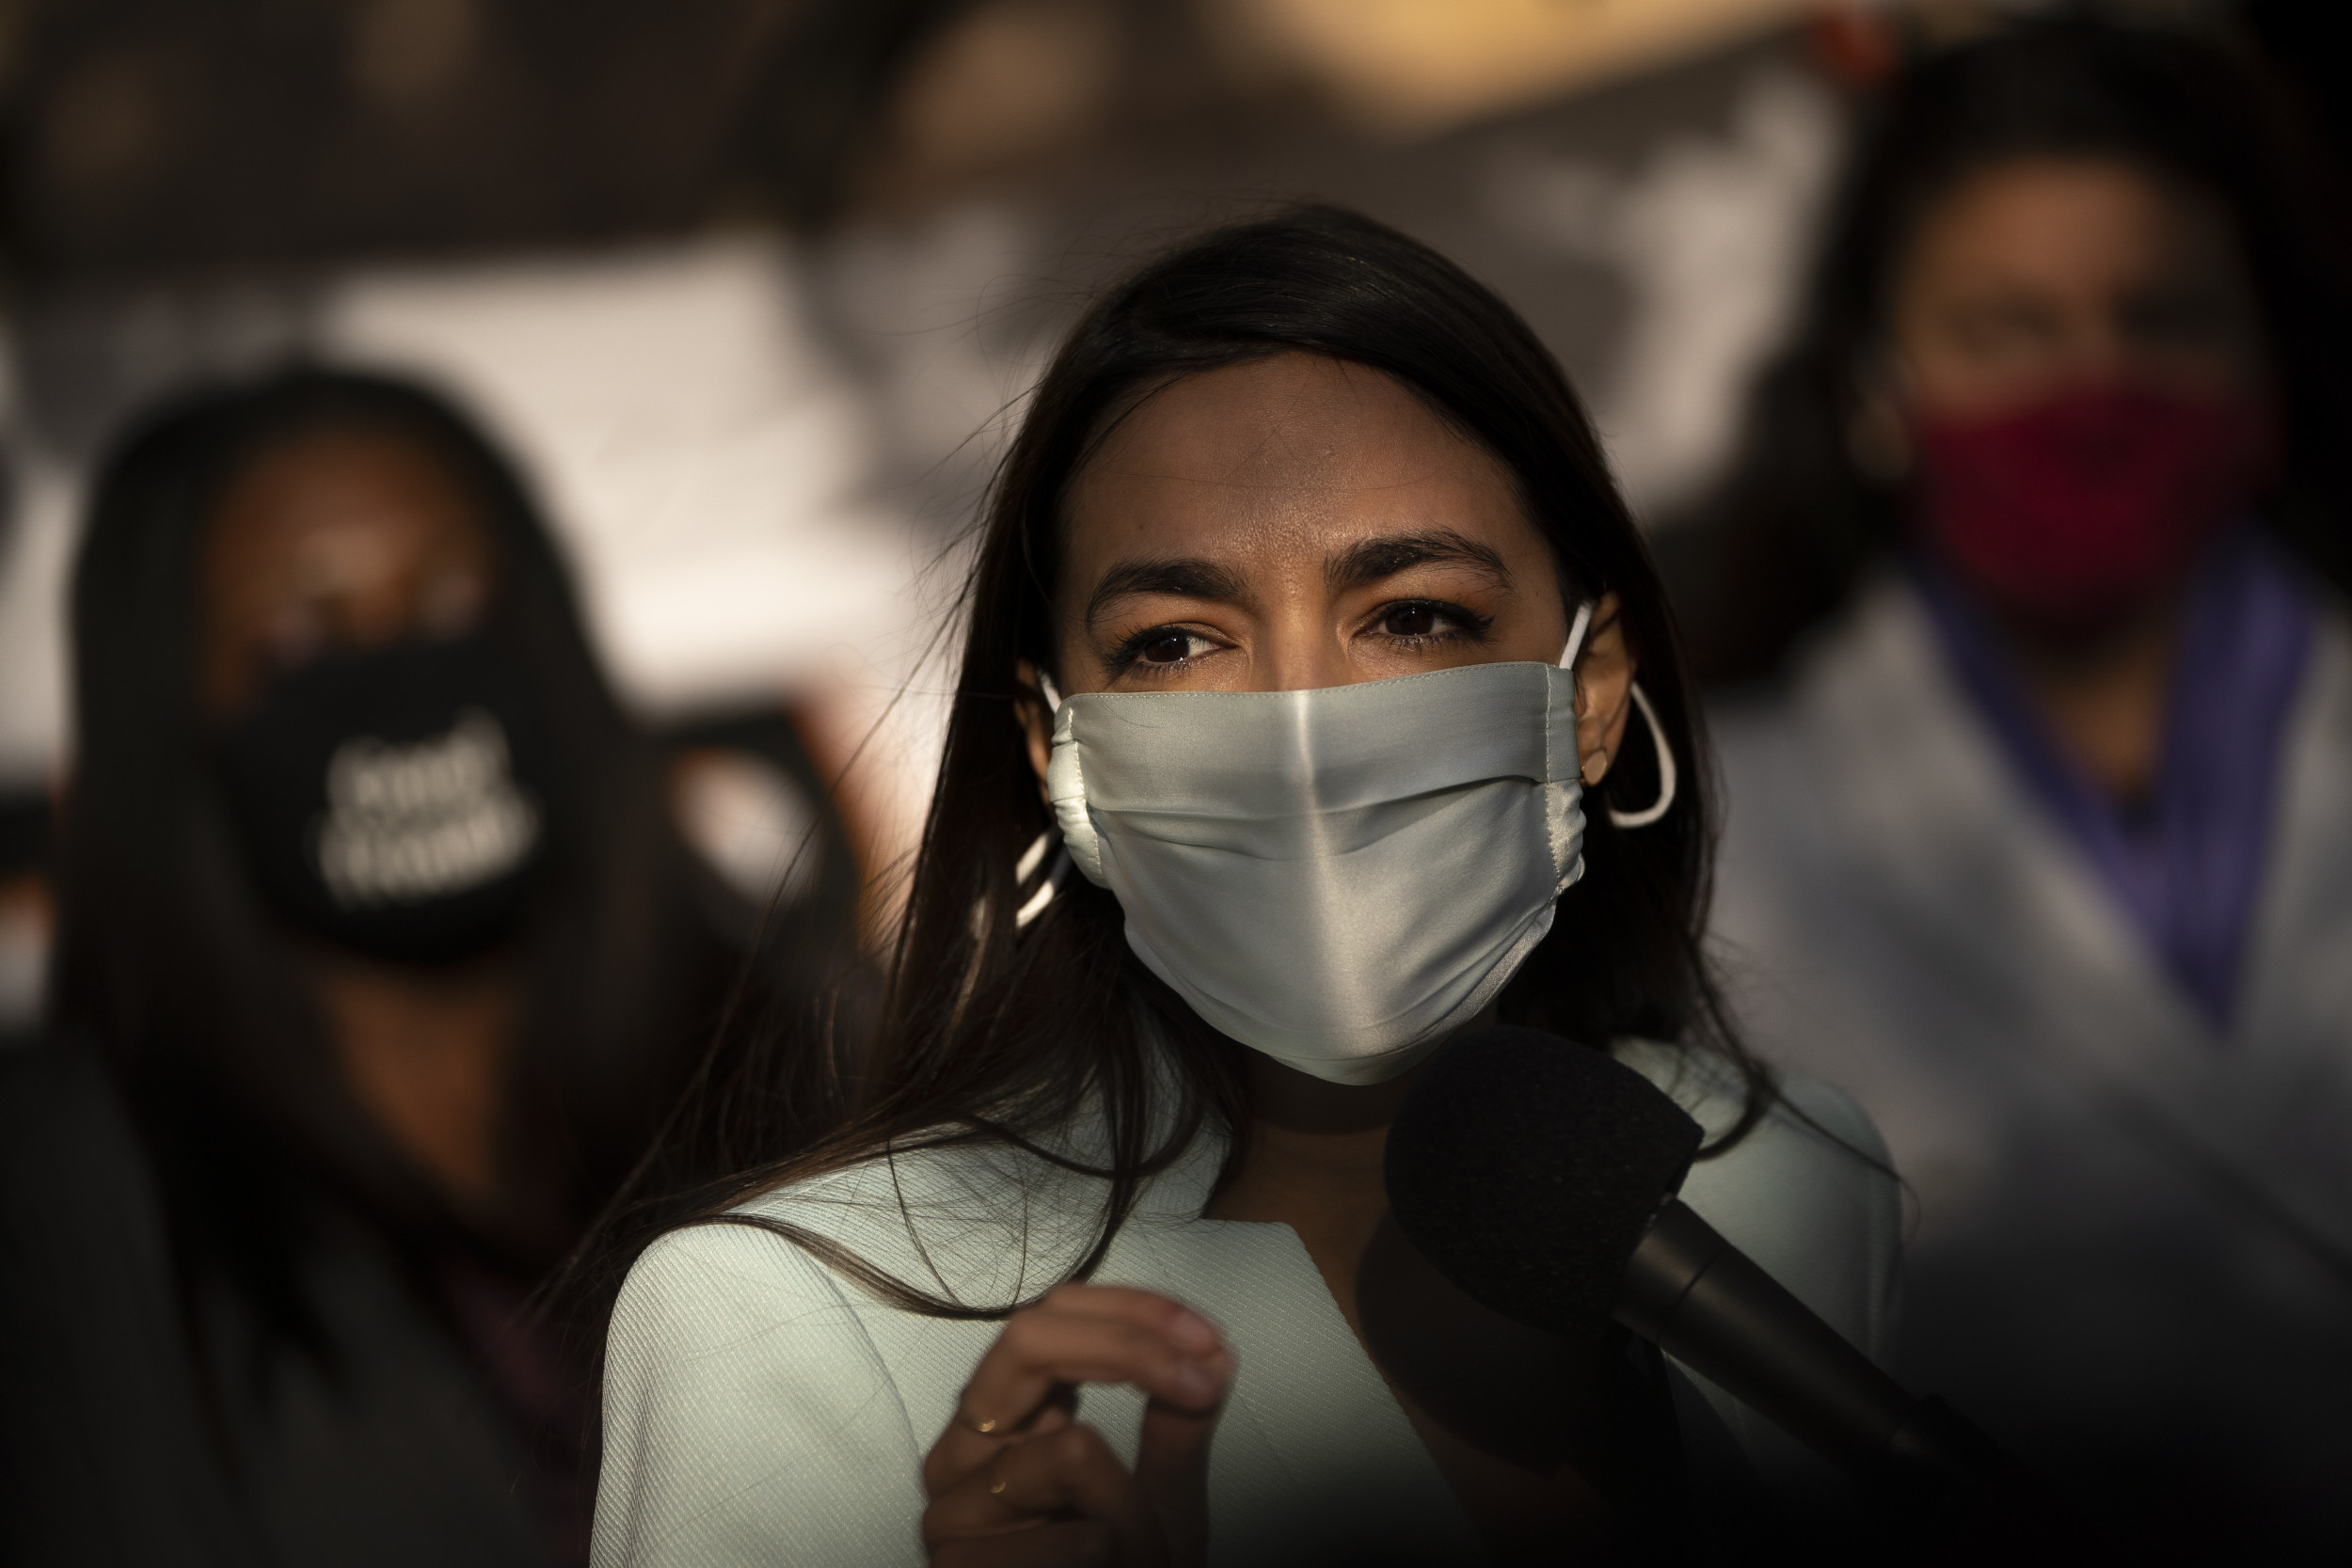 Alexandria Ocasio-Cortez takes on Ted Cruz's Paris climate agreement comments